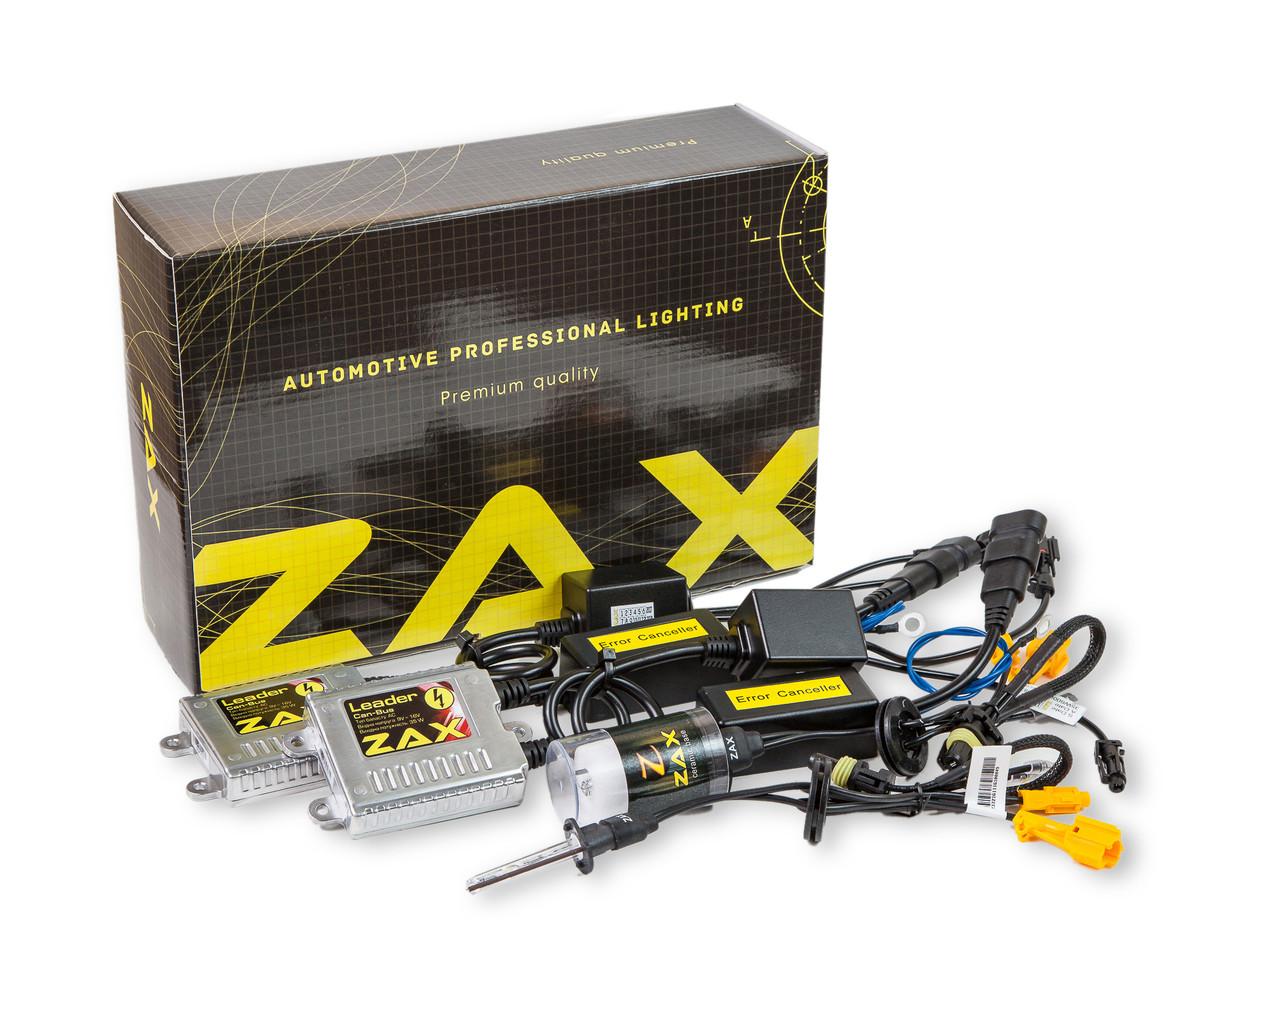 Комплект ксенона ZAX Leader Can-Bus 35W 9-16V H1 Ceramic 5000K, КОД: 148066